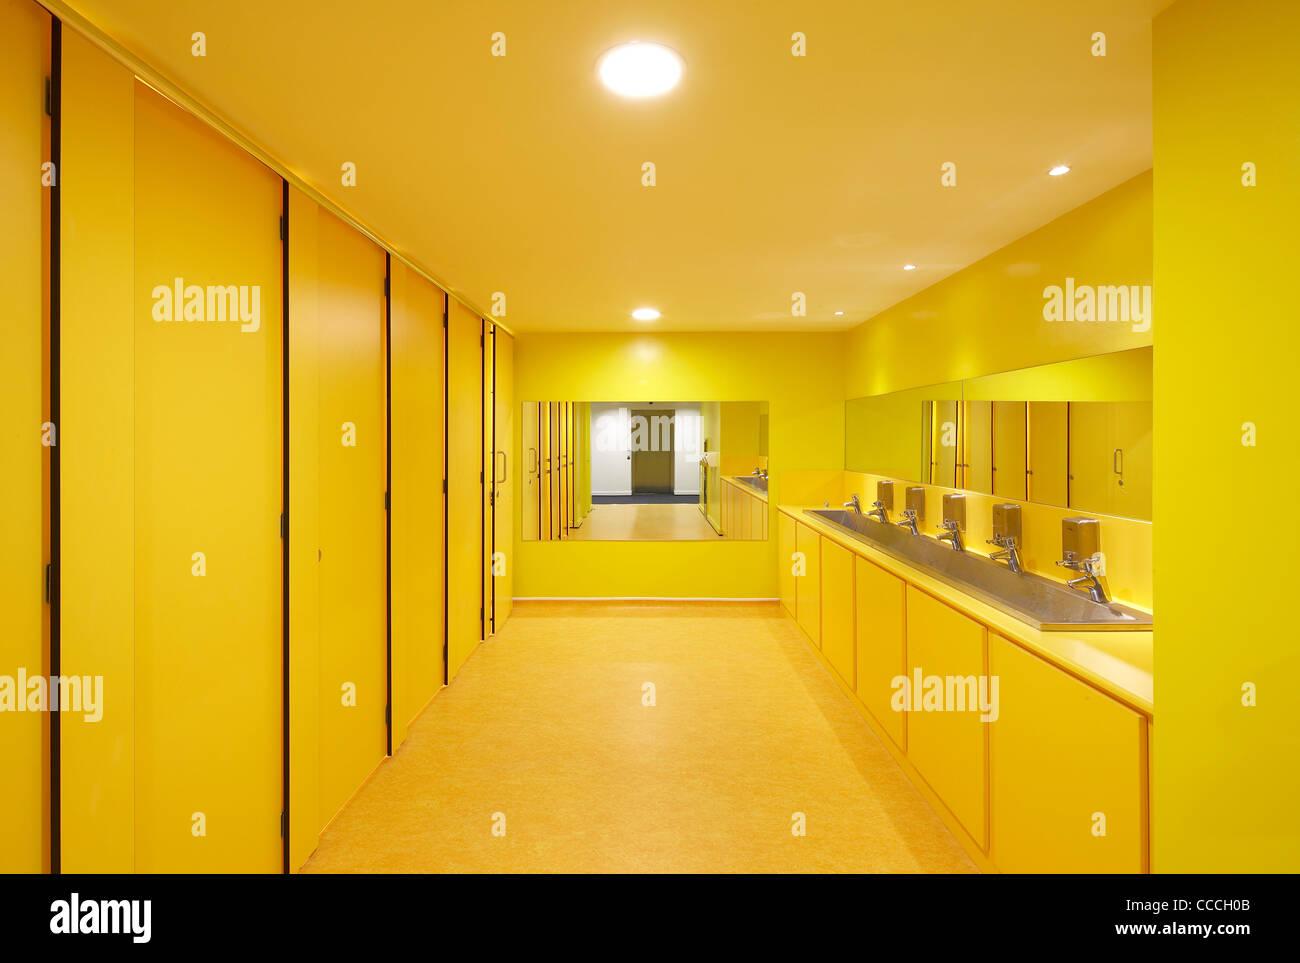 Rsa Academy, Tipton, United Kingdom, 2010 - Stock Image